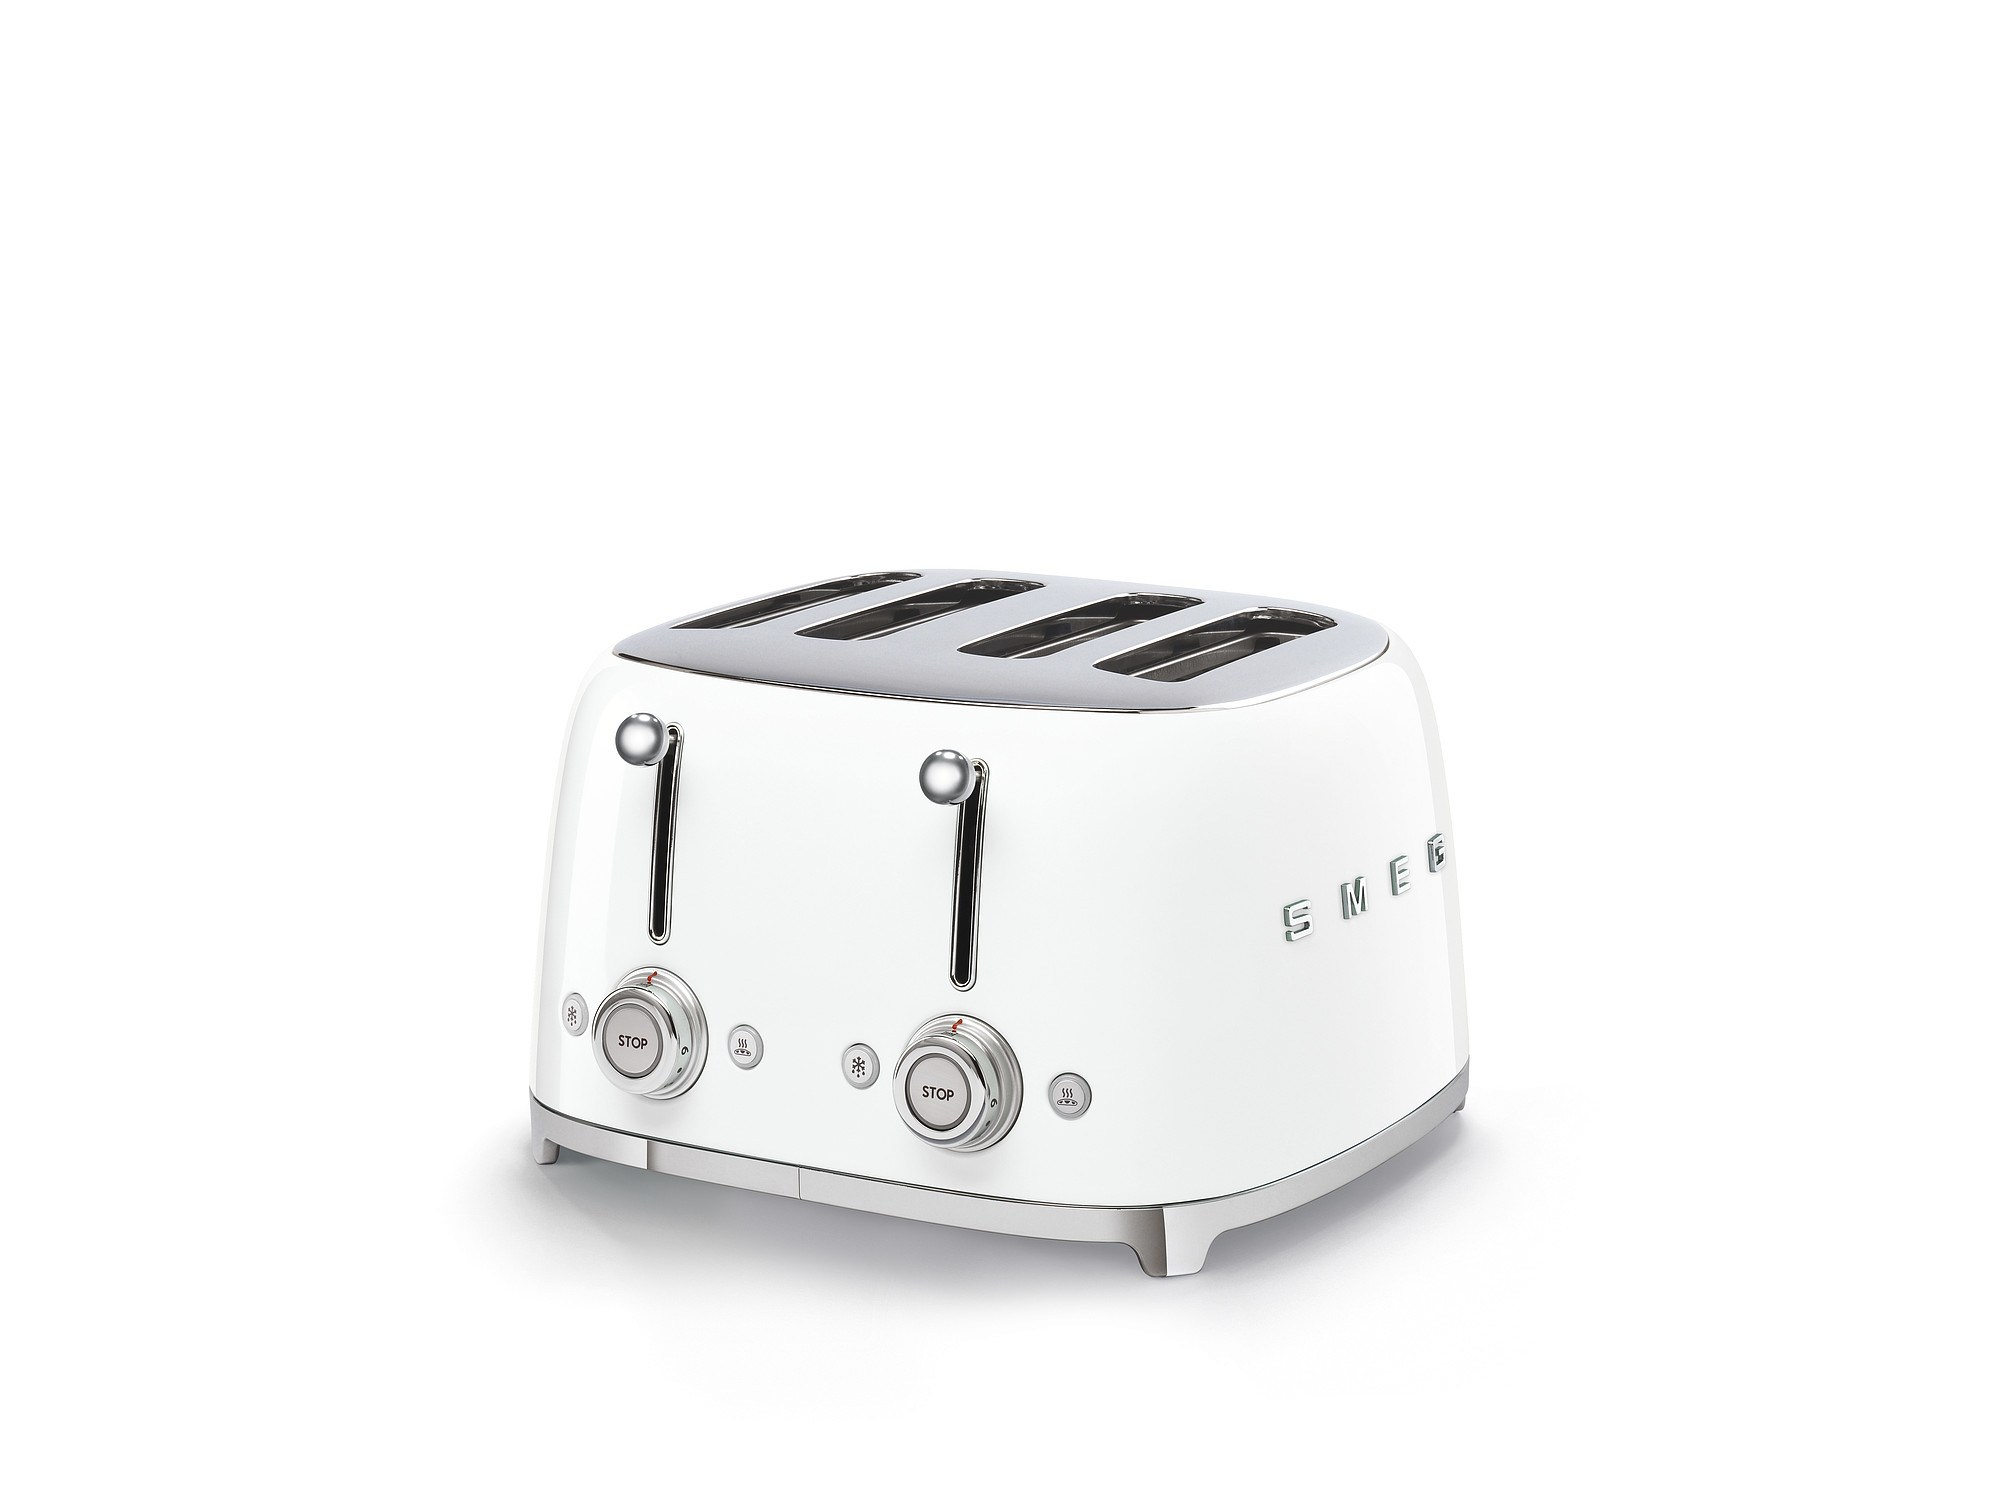 Smeg Kühlschrank Dolce Gabbana : Smeg tsf03wheu 4 schlitz toaster weiß günstig online kaufen